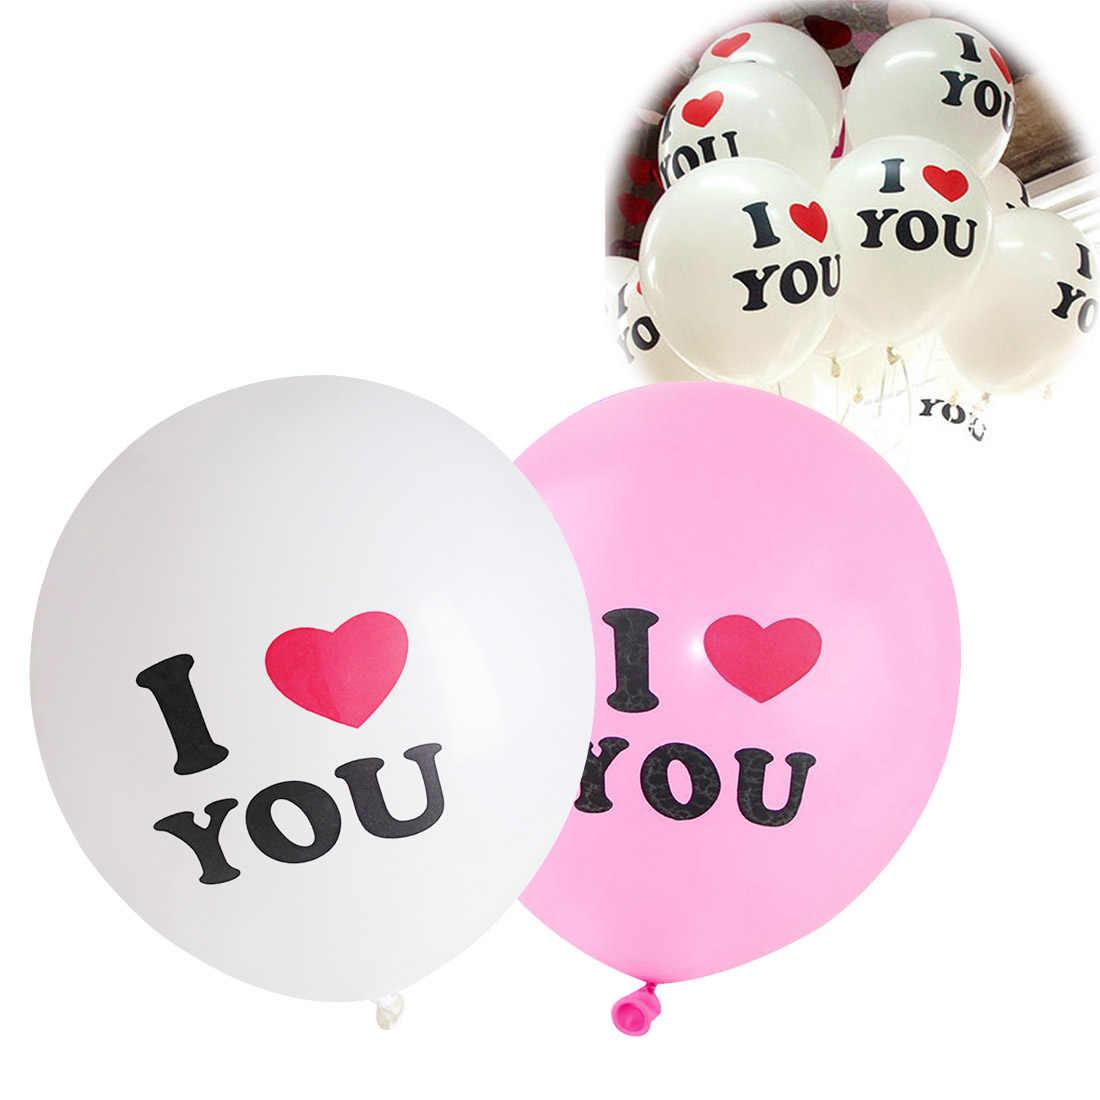 10pcs ทนทาน I LOVE YOU Heart Pearl Latex บอลลูน Globos บอลลูนสำหรับคริสต์มาสงานแต่งงาน san valentin 12 นิ้วบอลลูน